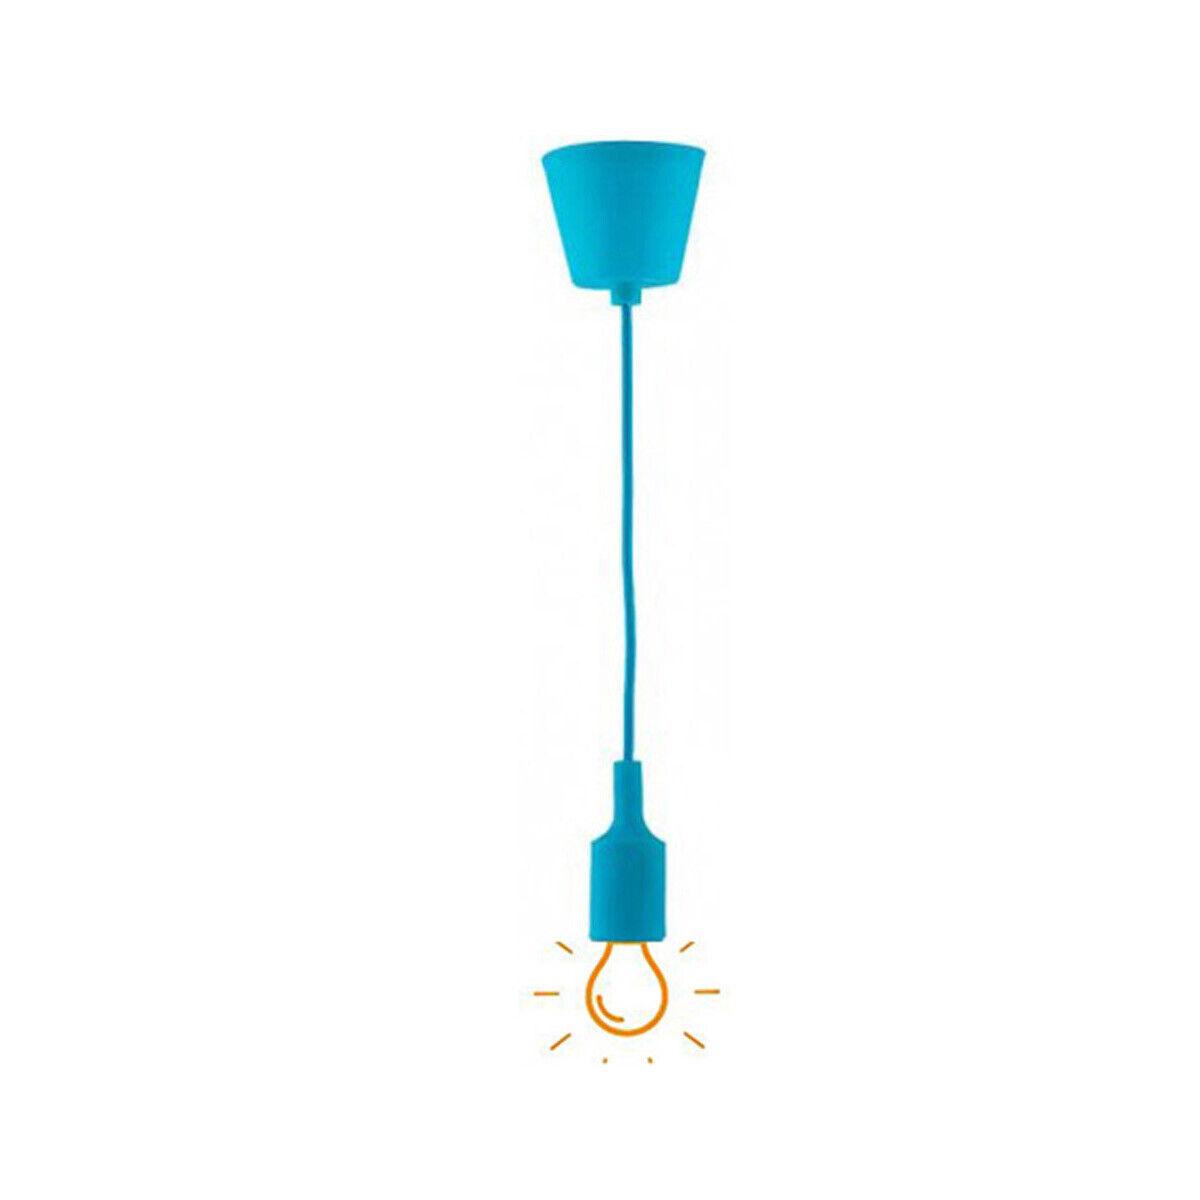 E27 PVC Lampenhalter Deckenlampe PVC Anhänger Lampenfassung Fassung Modern